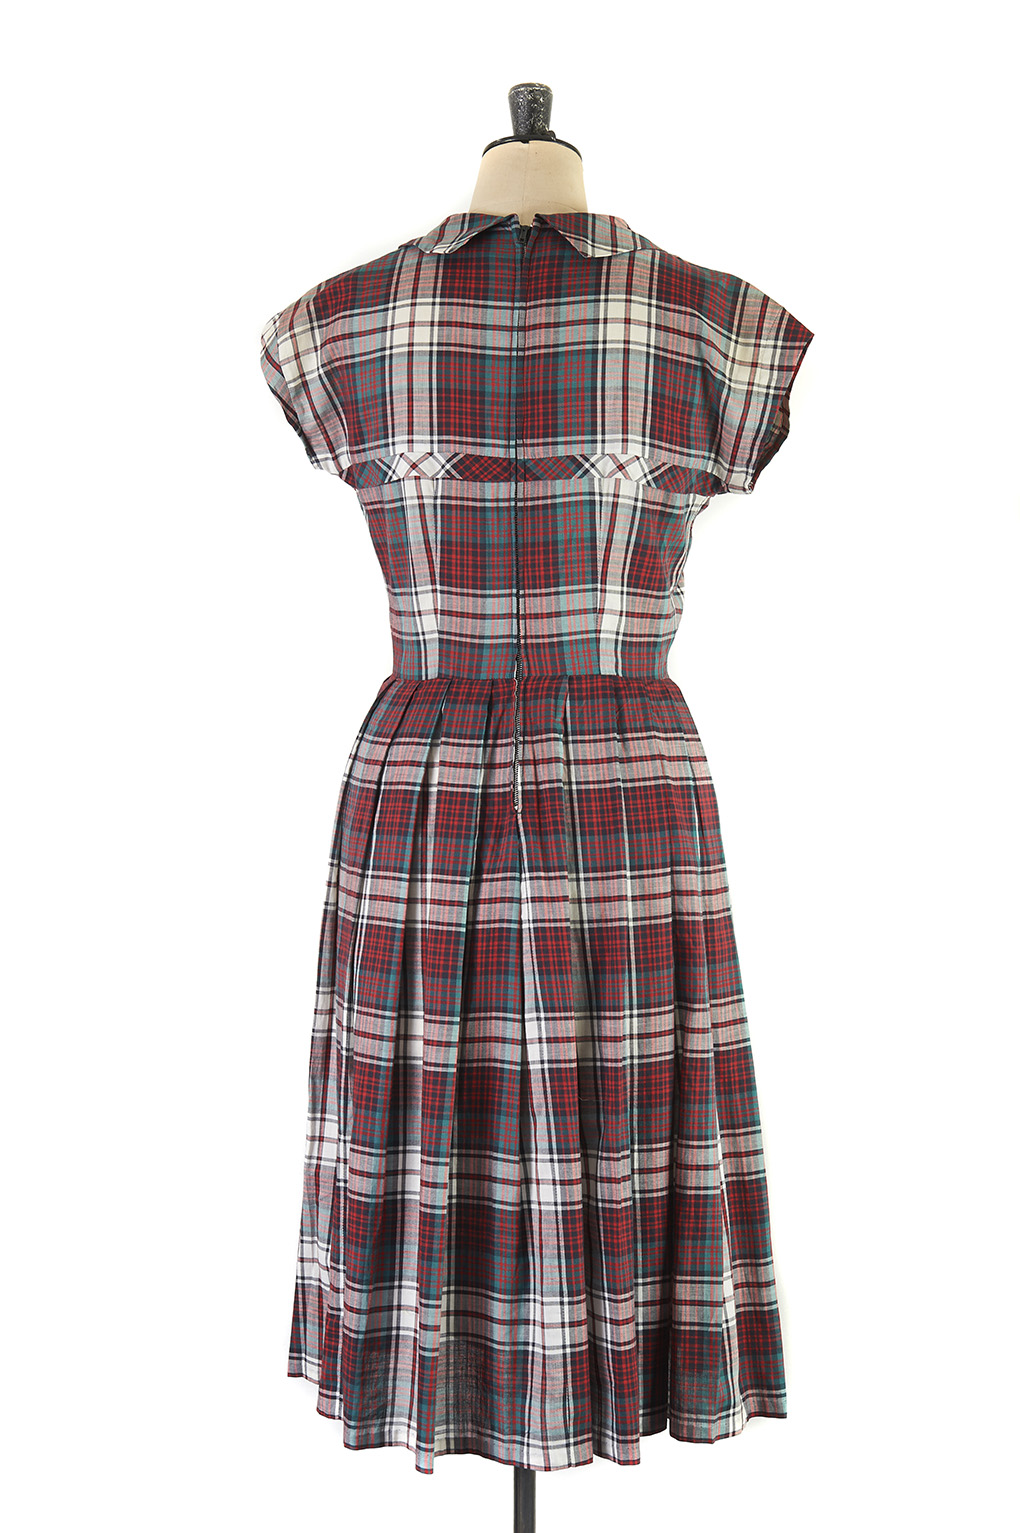 Tartan Dress c.1950